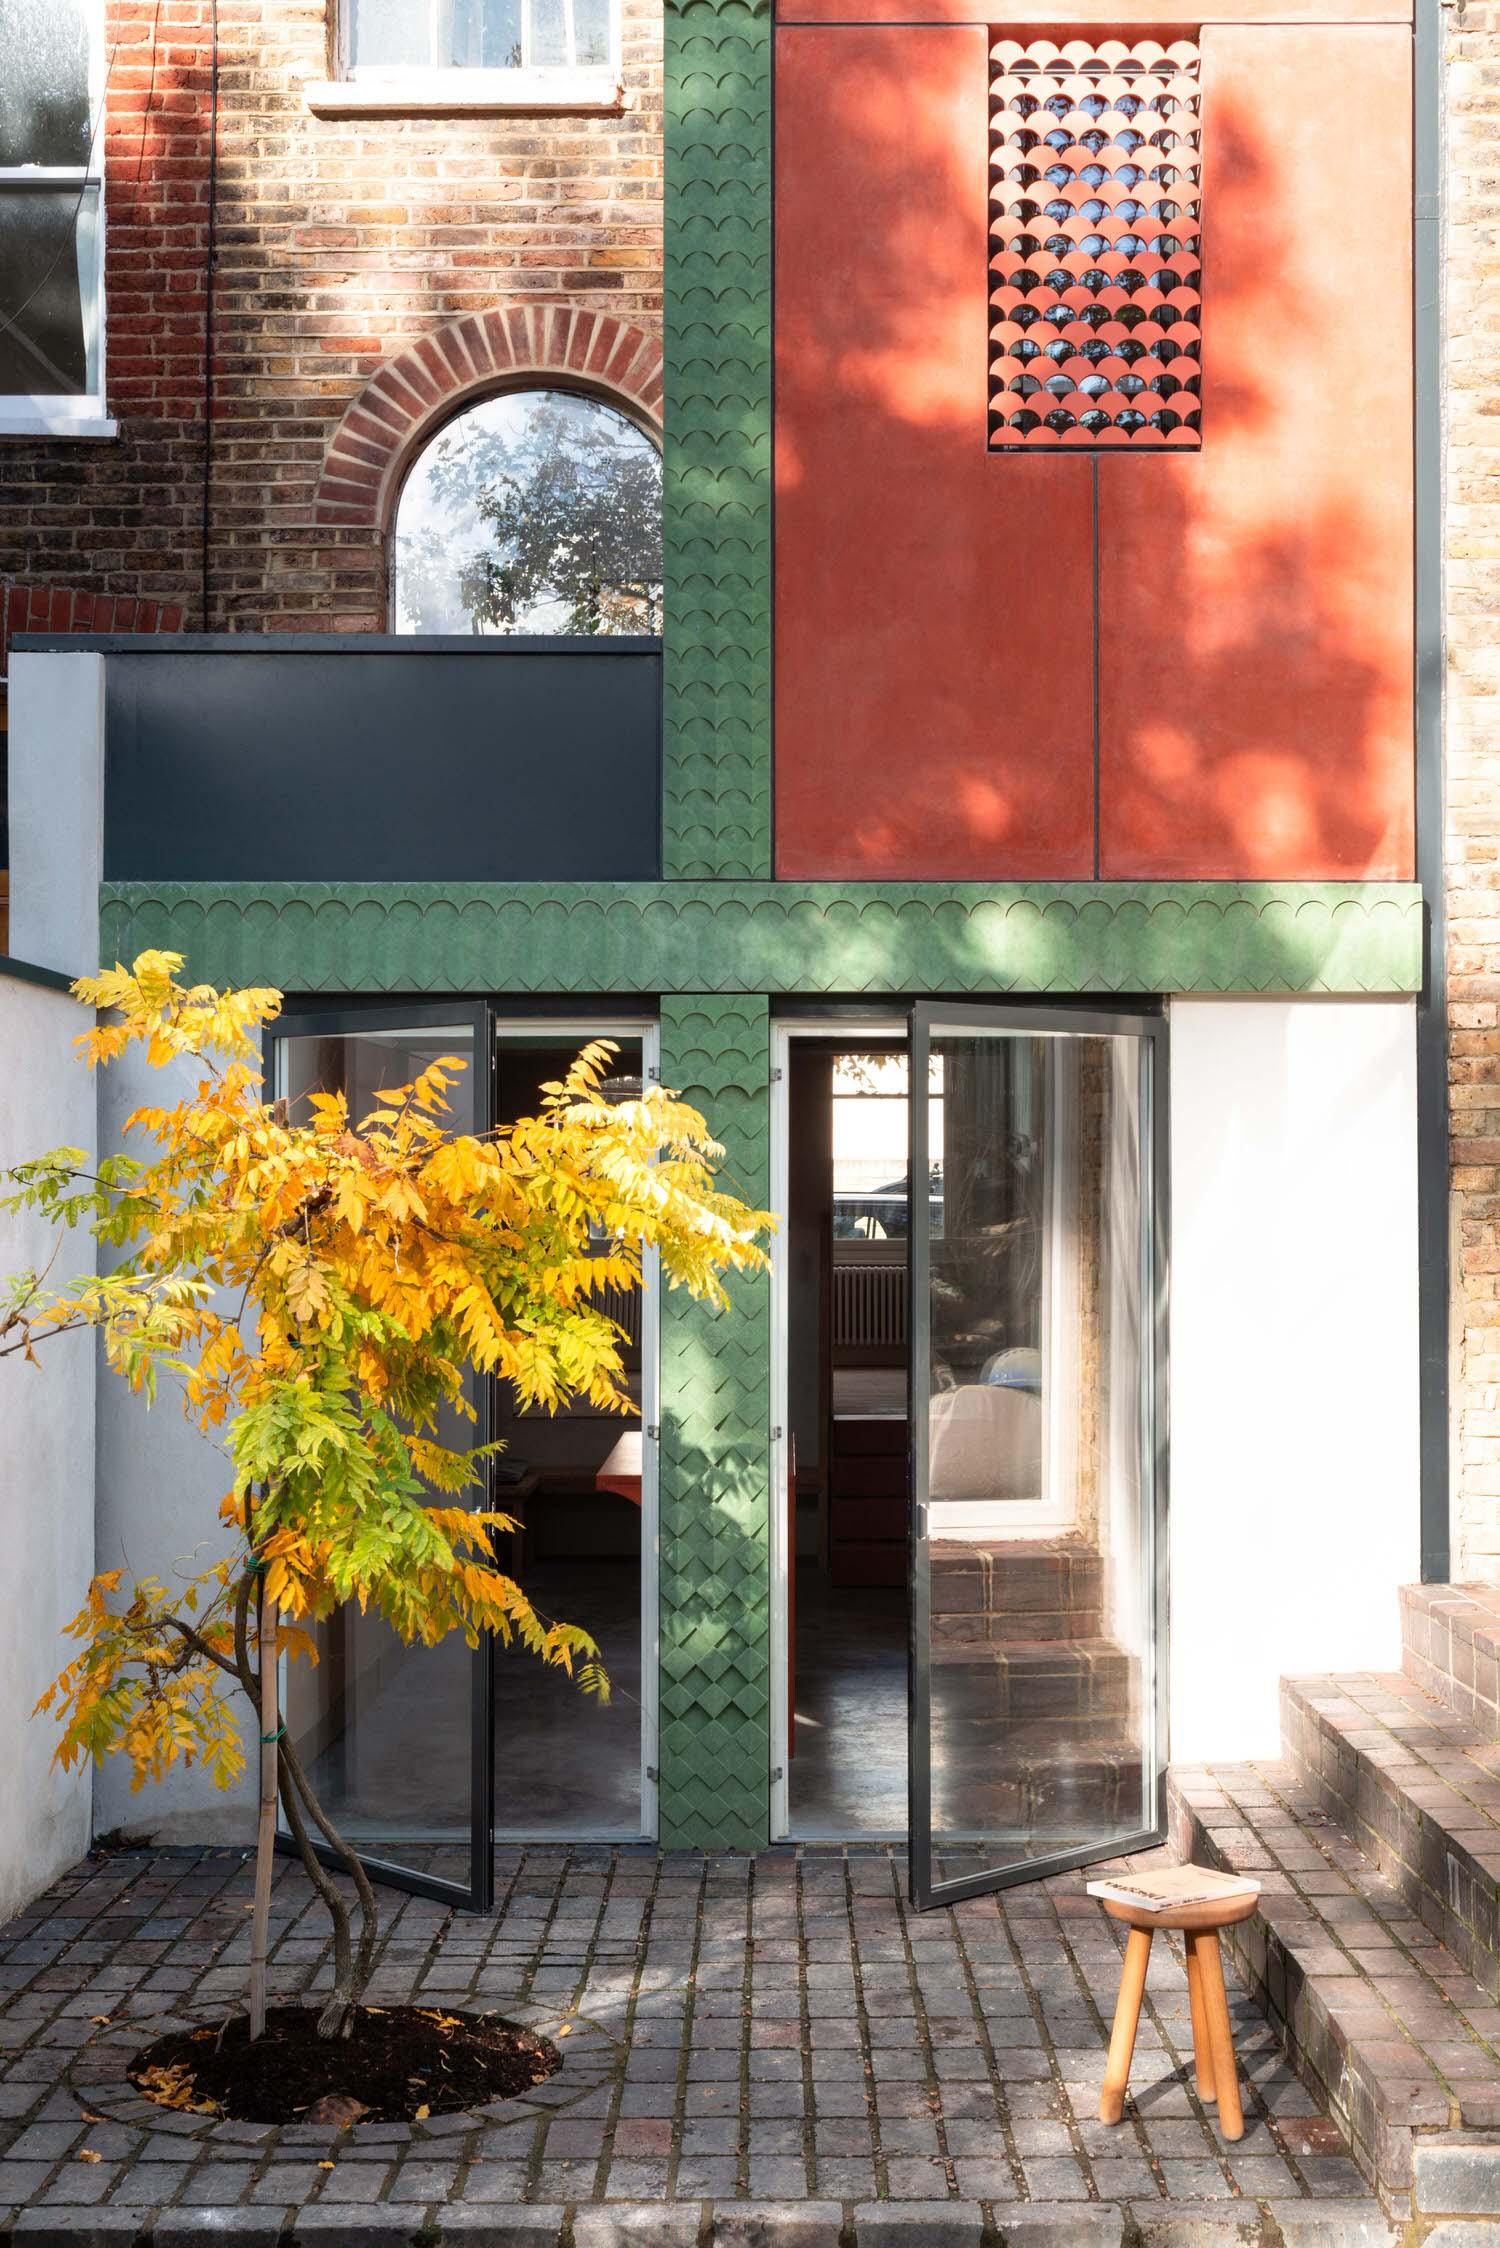 Studio Ben Allen House Recast London Residential Architecture Photo French+tye Yellowtrace 11